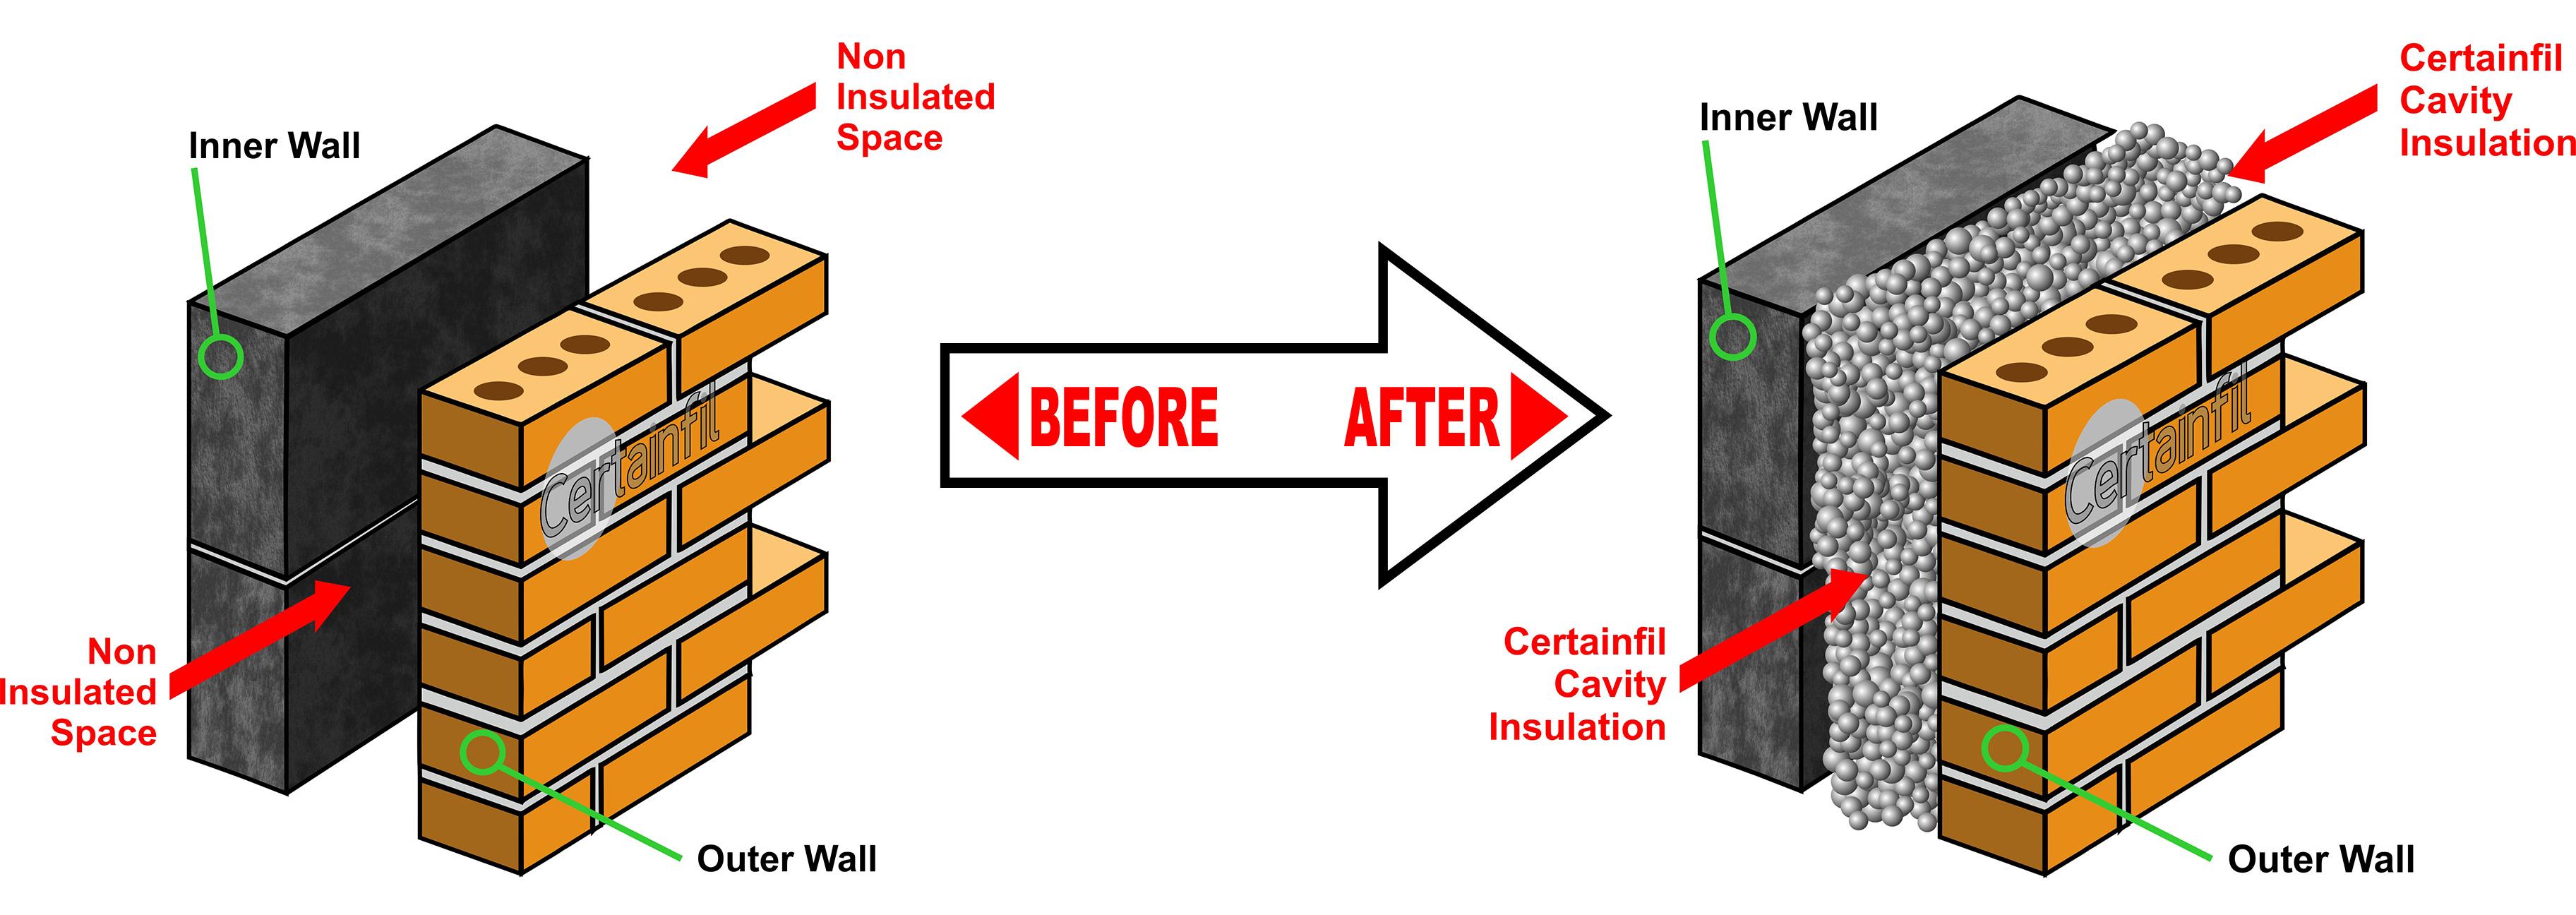 Cavity Wall Insulation Lancashire Staywarm Energy